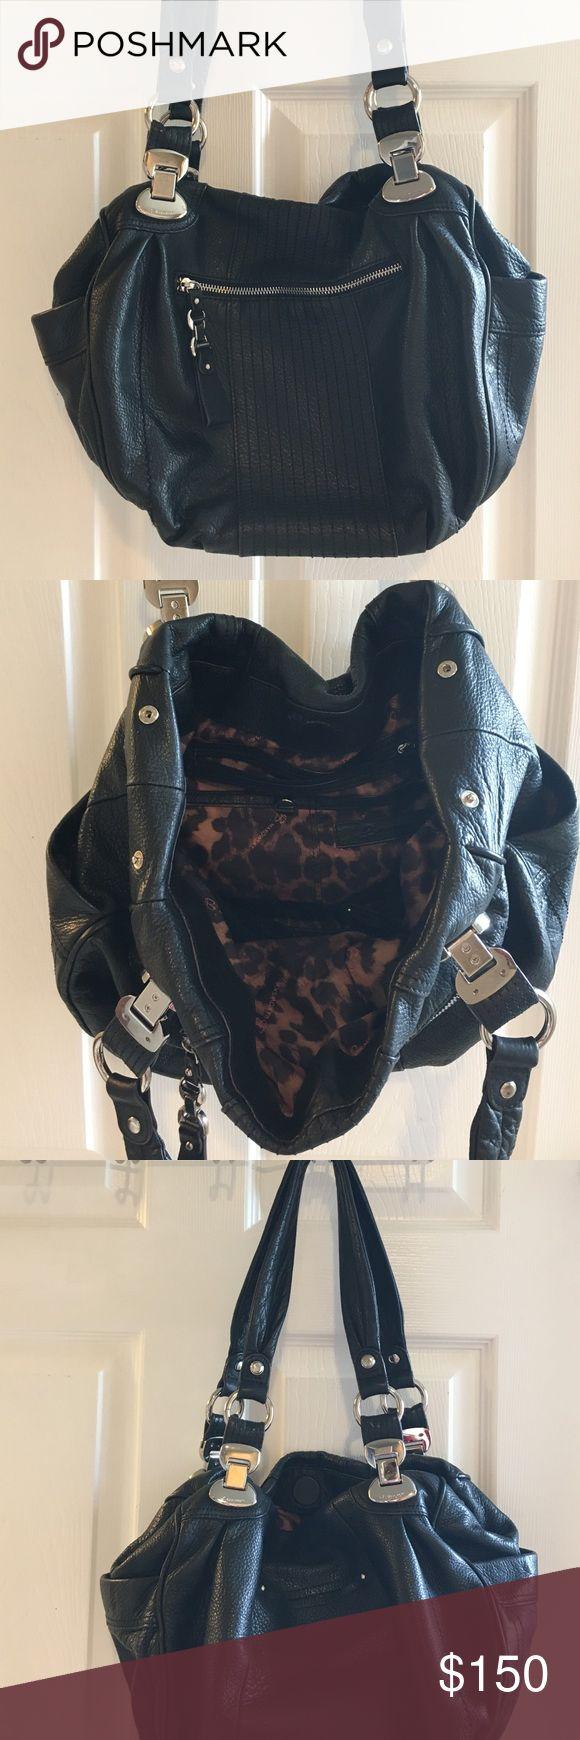 B. Makowsky black leather handbag Extremely soft B. Makowsky leather handbag. Several interior and exterior pockets! b. makowsky Bags Shoulder Bags